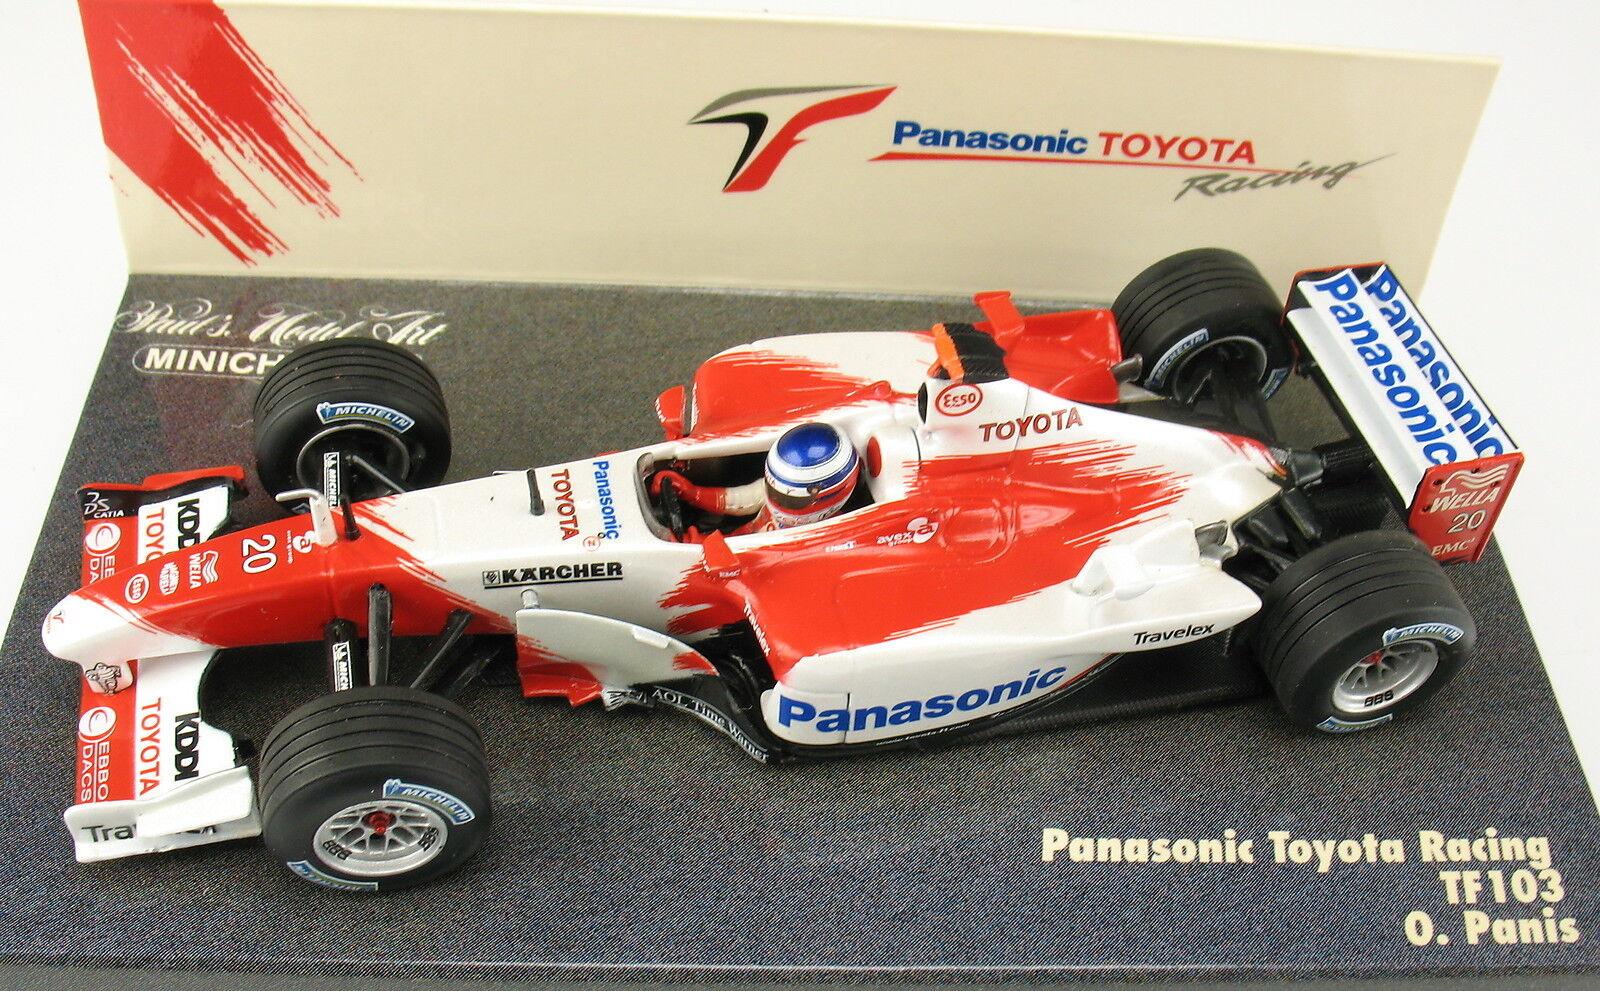 Minichamps-f1 panasonic toyota racing tf103-o panis-firmado panis-firmado panis-firmado signed - 1 43 3eee61